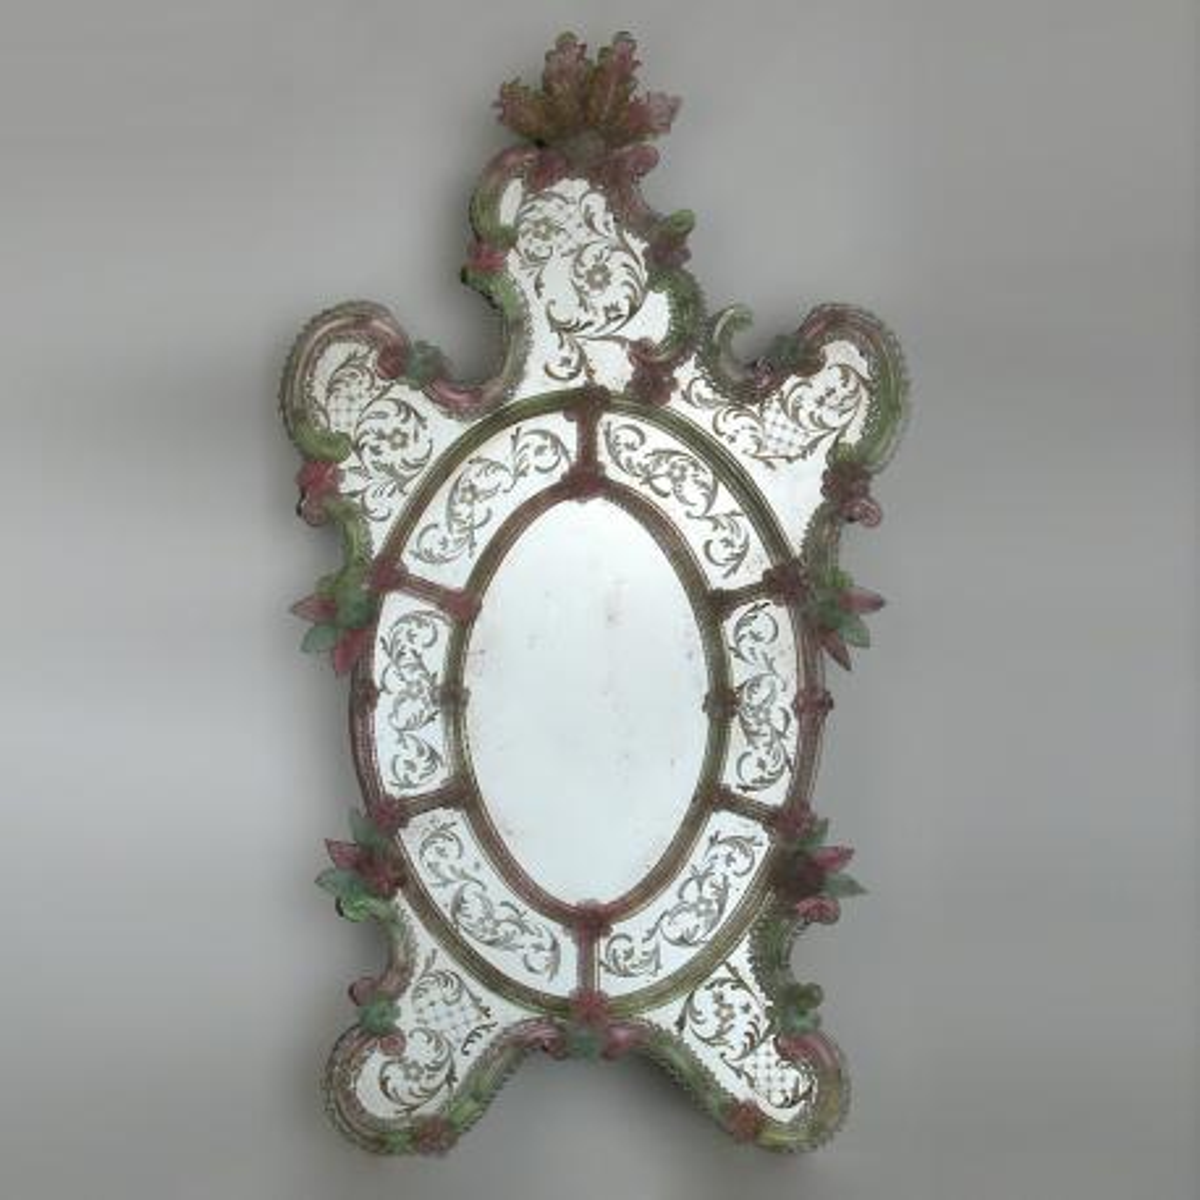 """Sebastian"" Murano glas venezianischen spiegel"